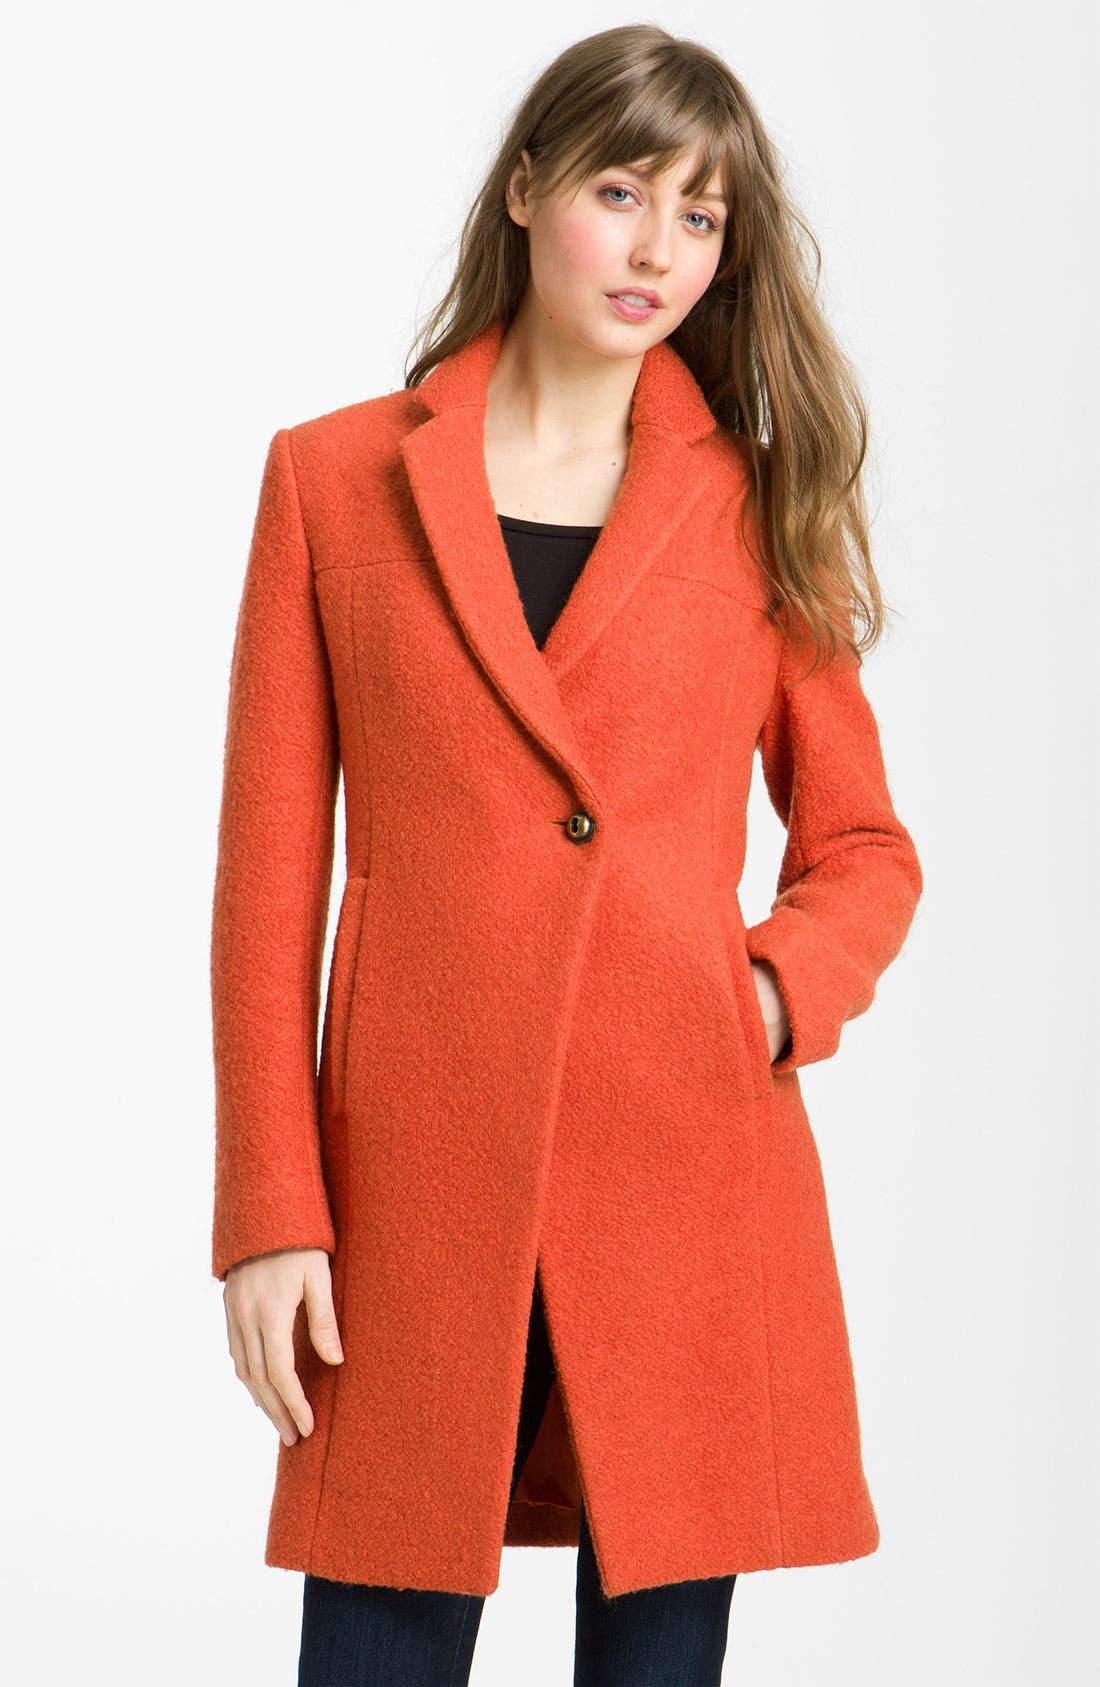 Alternate Image 1 Selected - Kenneth Cole New York Notch Collar Bouclé Coat